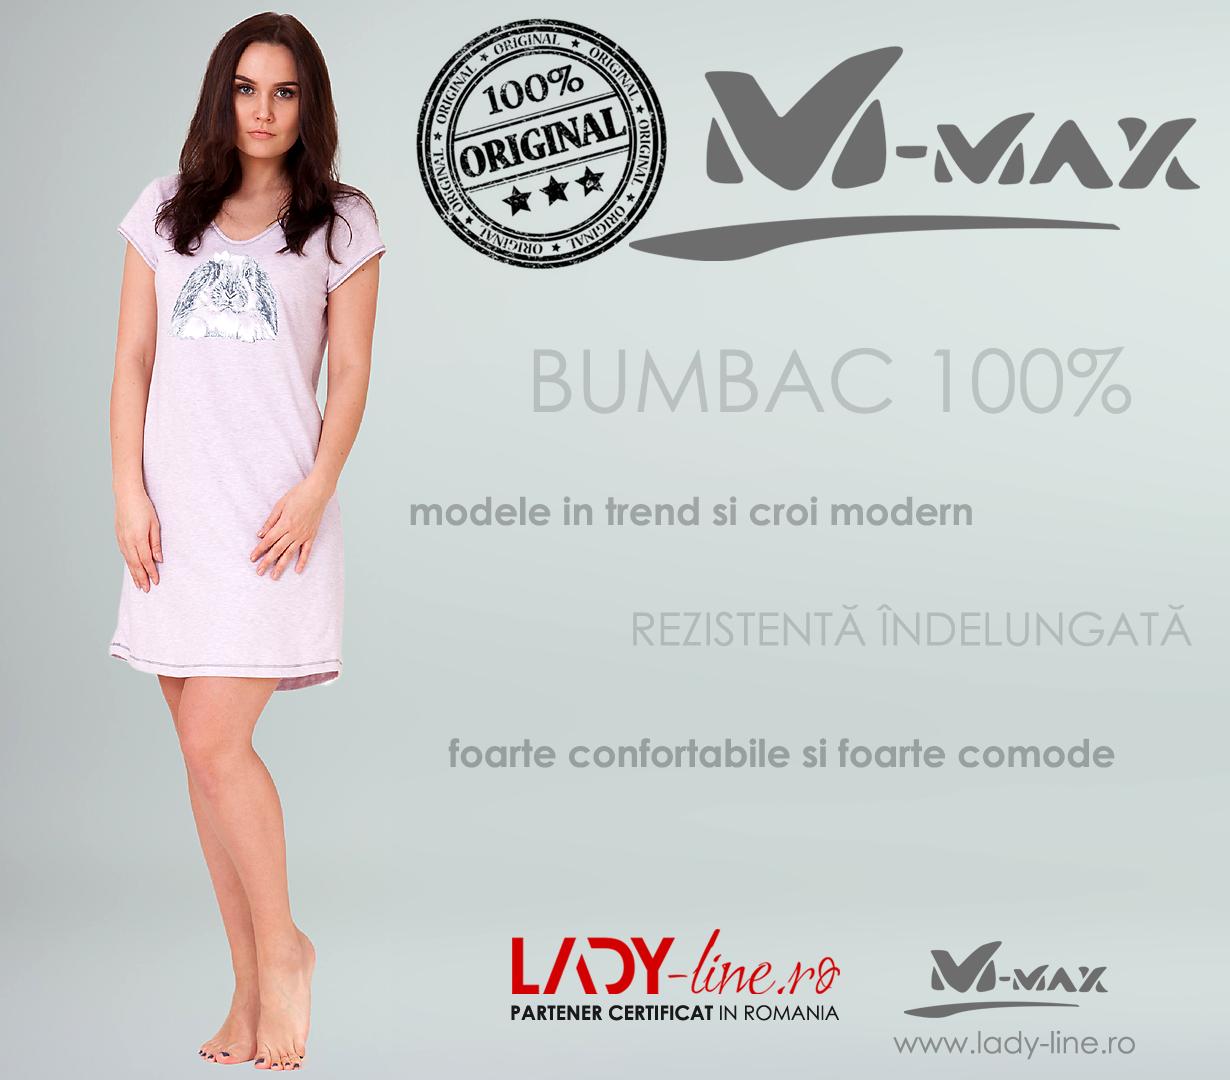 Camasa de Noapte M-Max, Bumbac 100%, 'Funny Bunny'